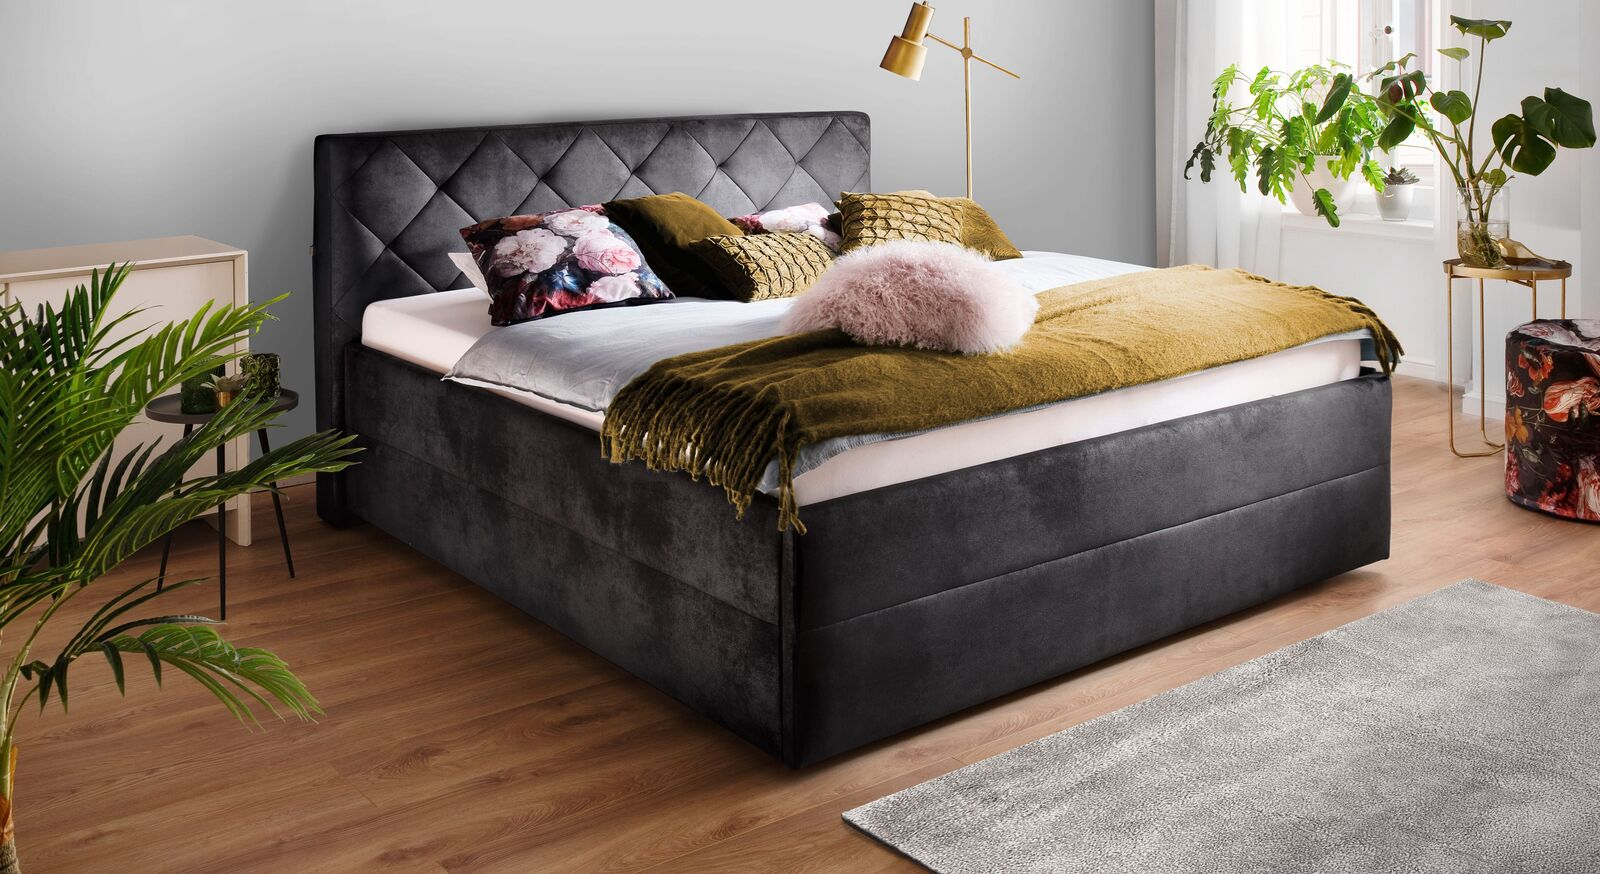 Bett Fambo aus schwarzem Velours-Lederimitat